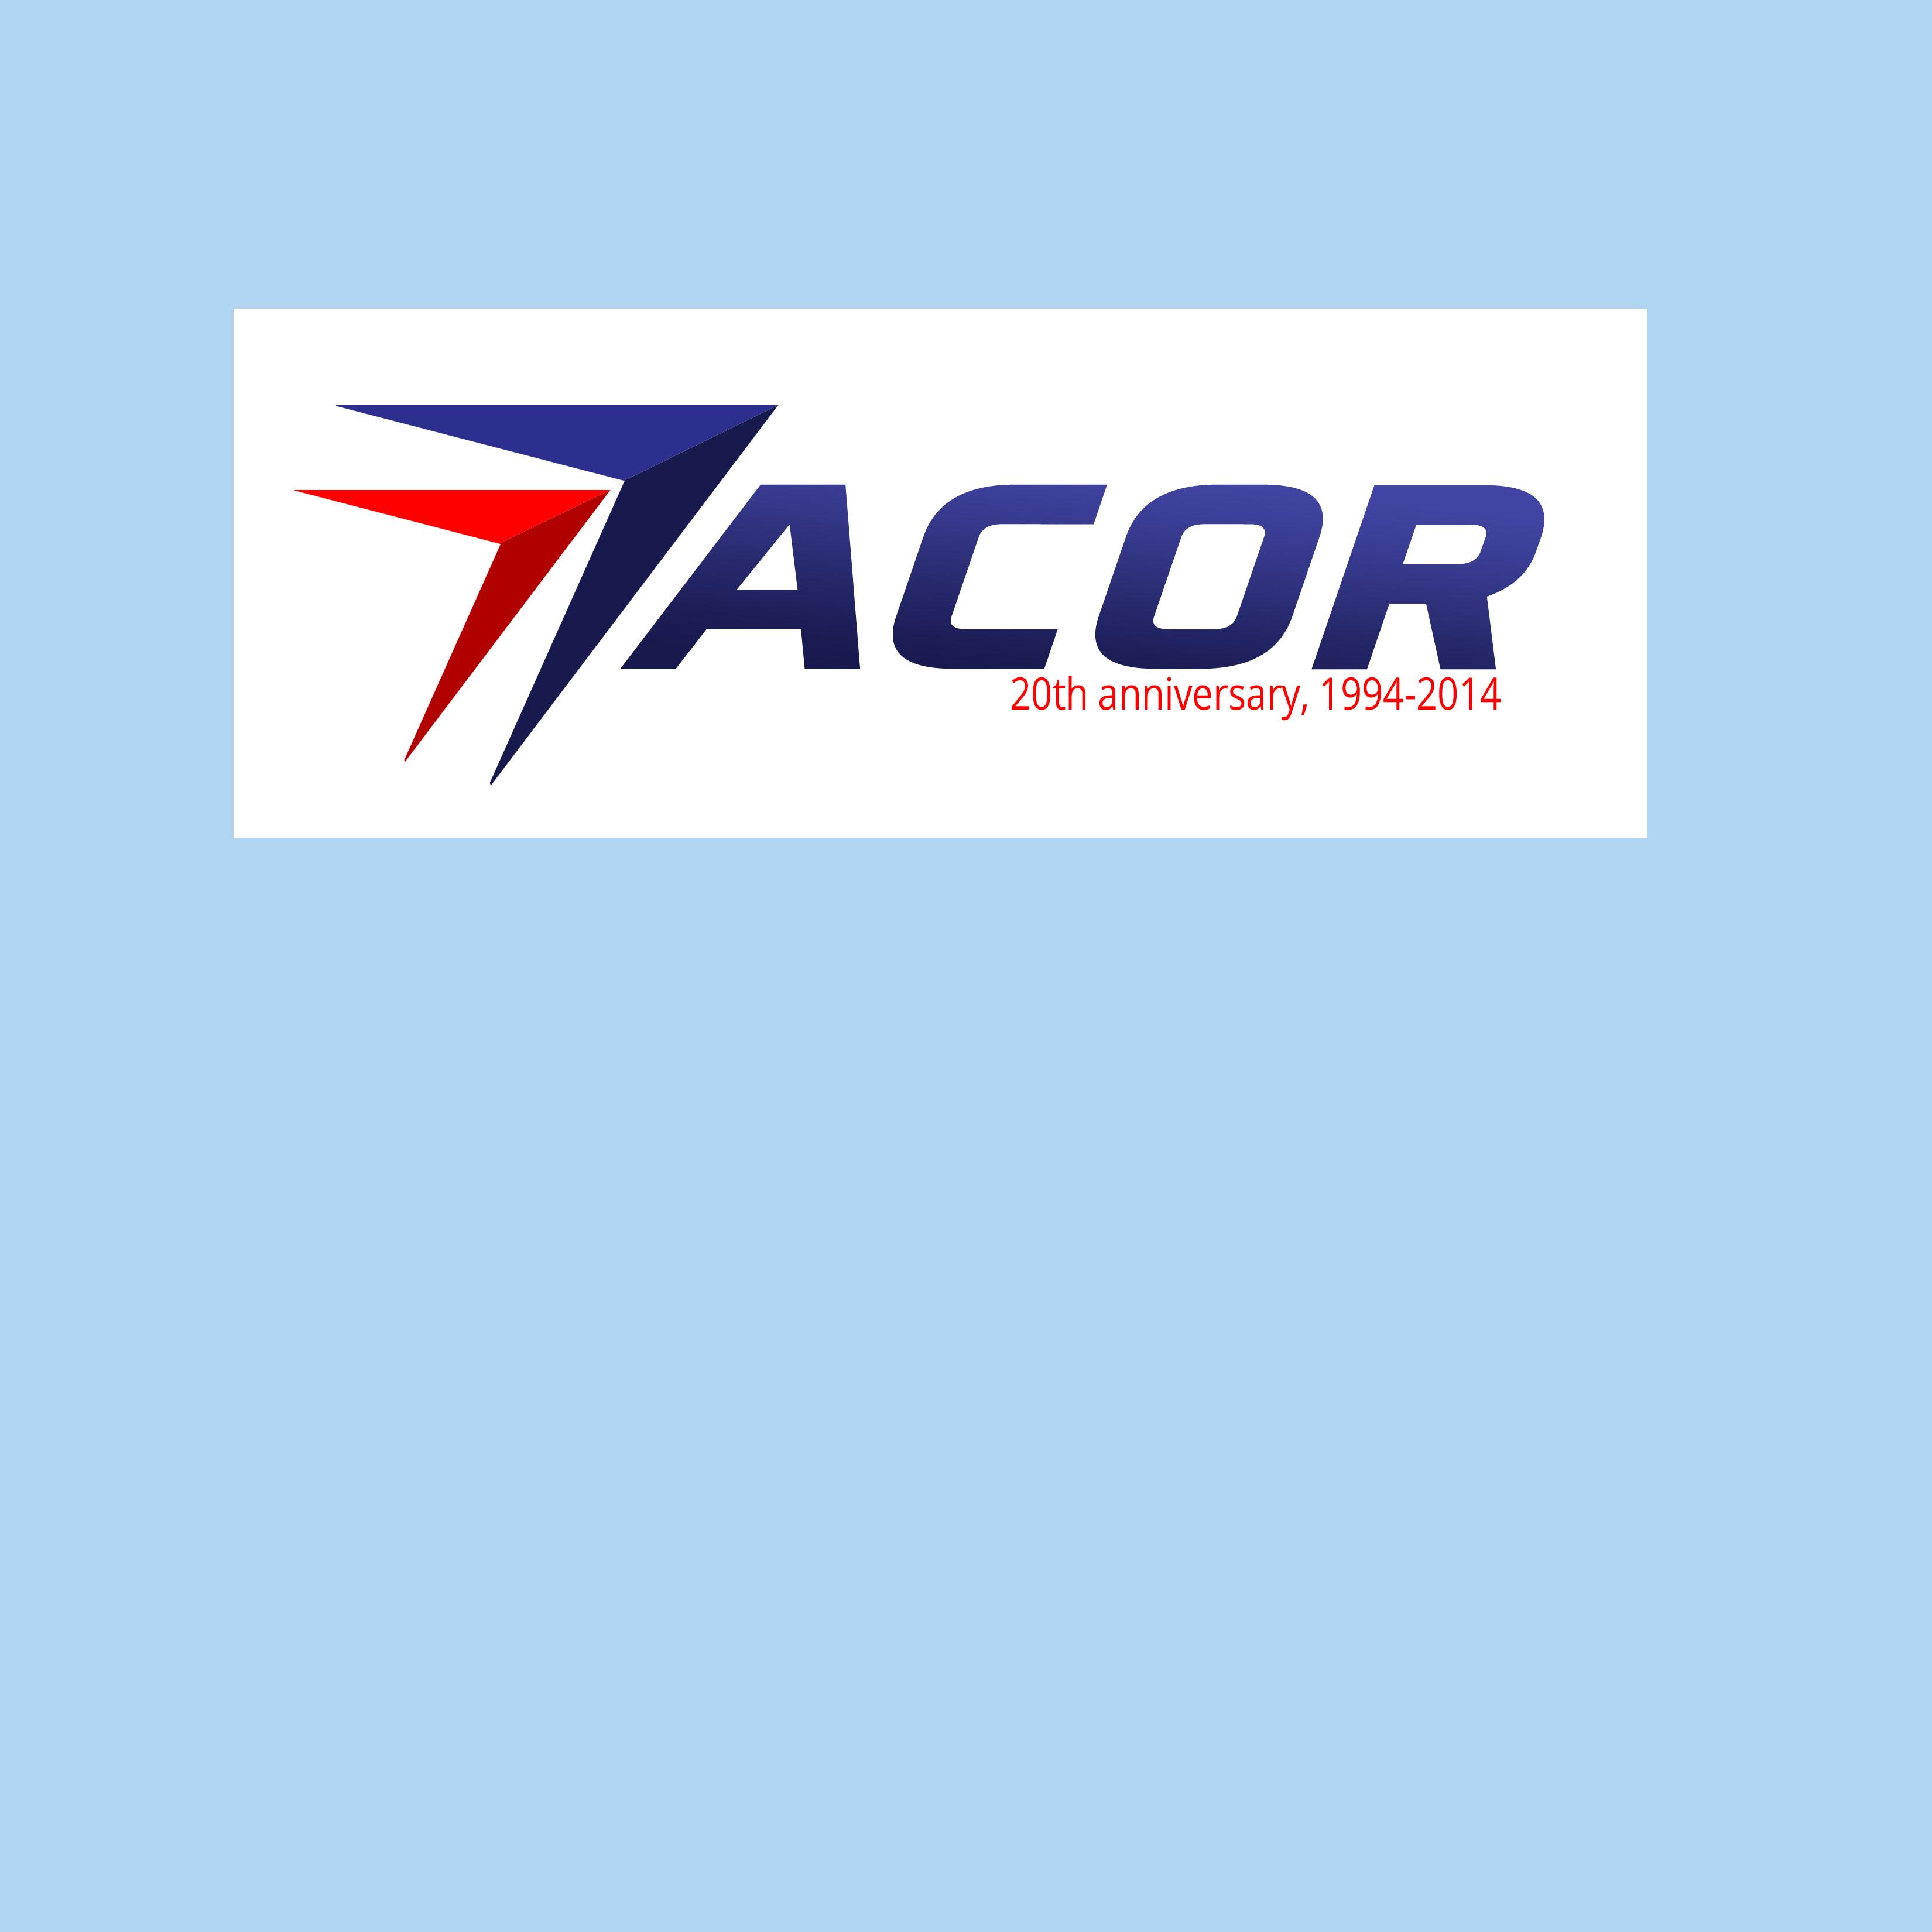 Logo Design by Allan Esclamado - Entry No. 40 in the Logo Design Contest Artistic Logo Design for TACOR.